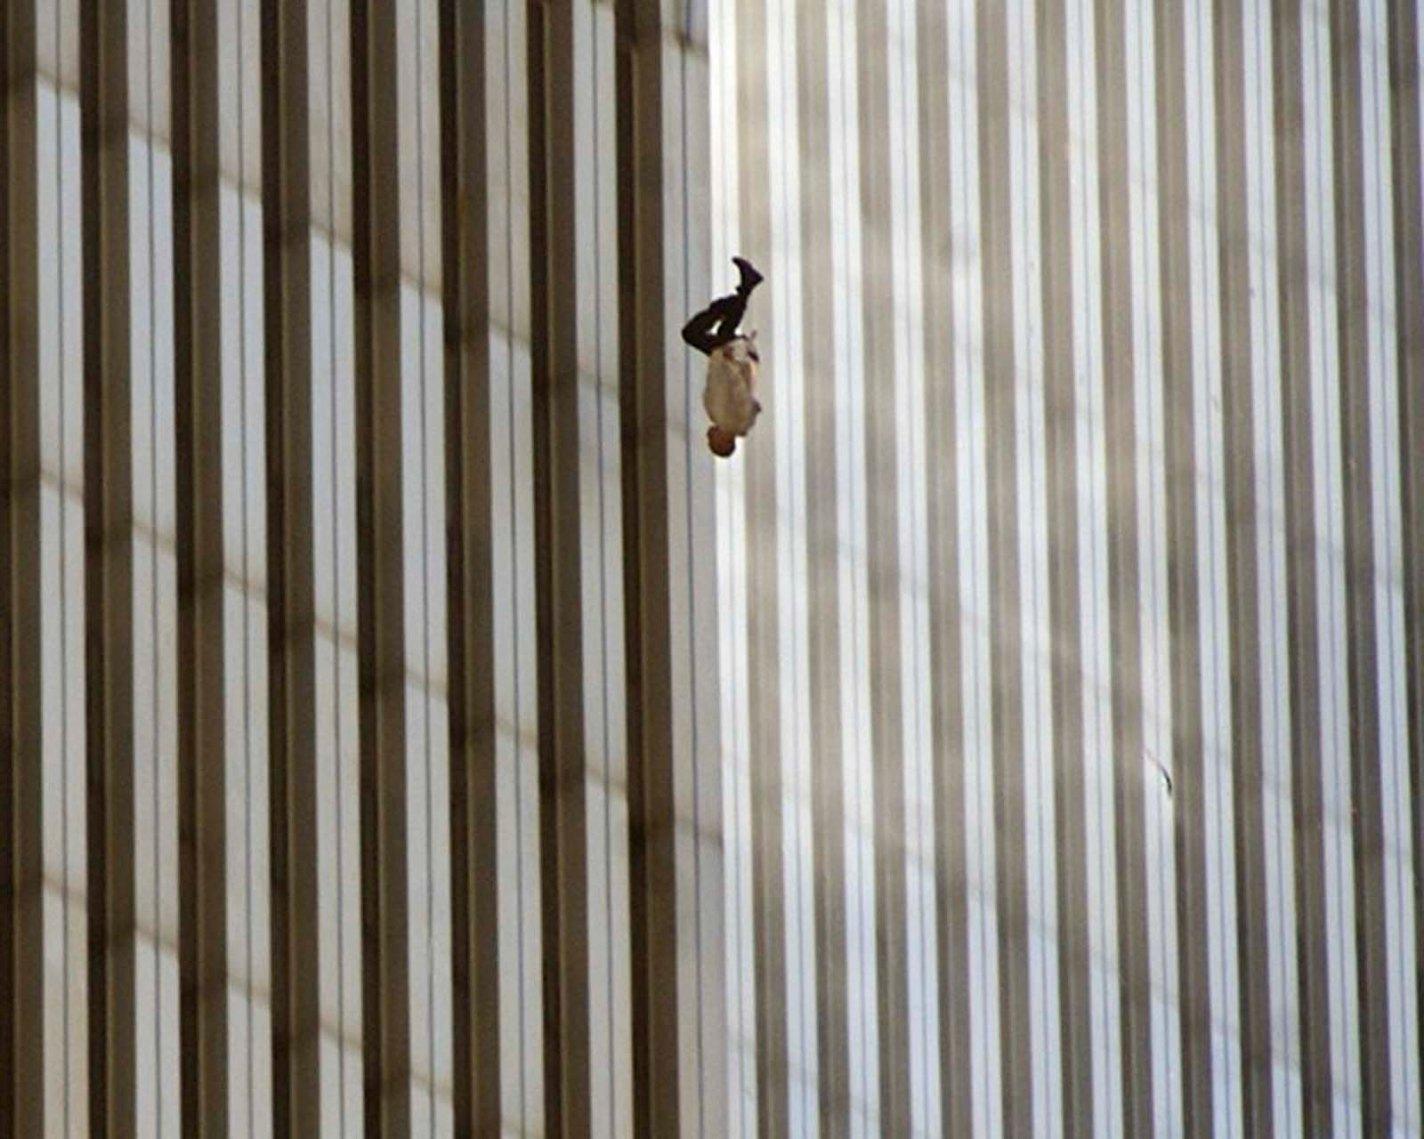 history photo Falling Man, Richard Drew, 2001